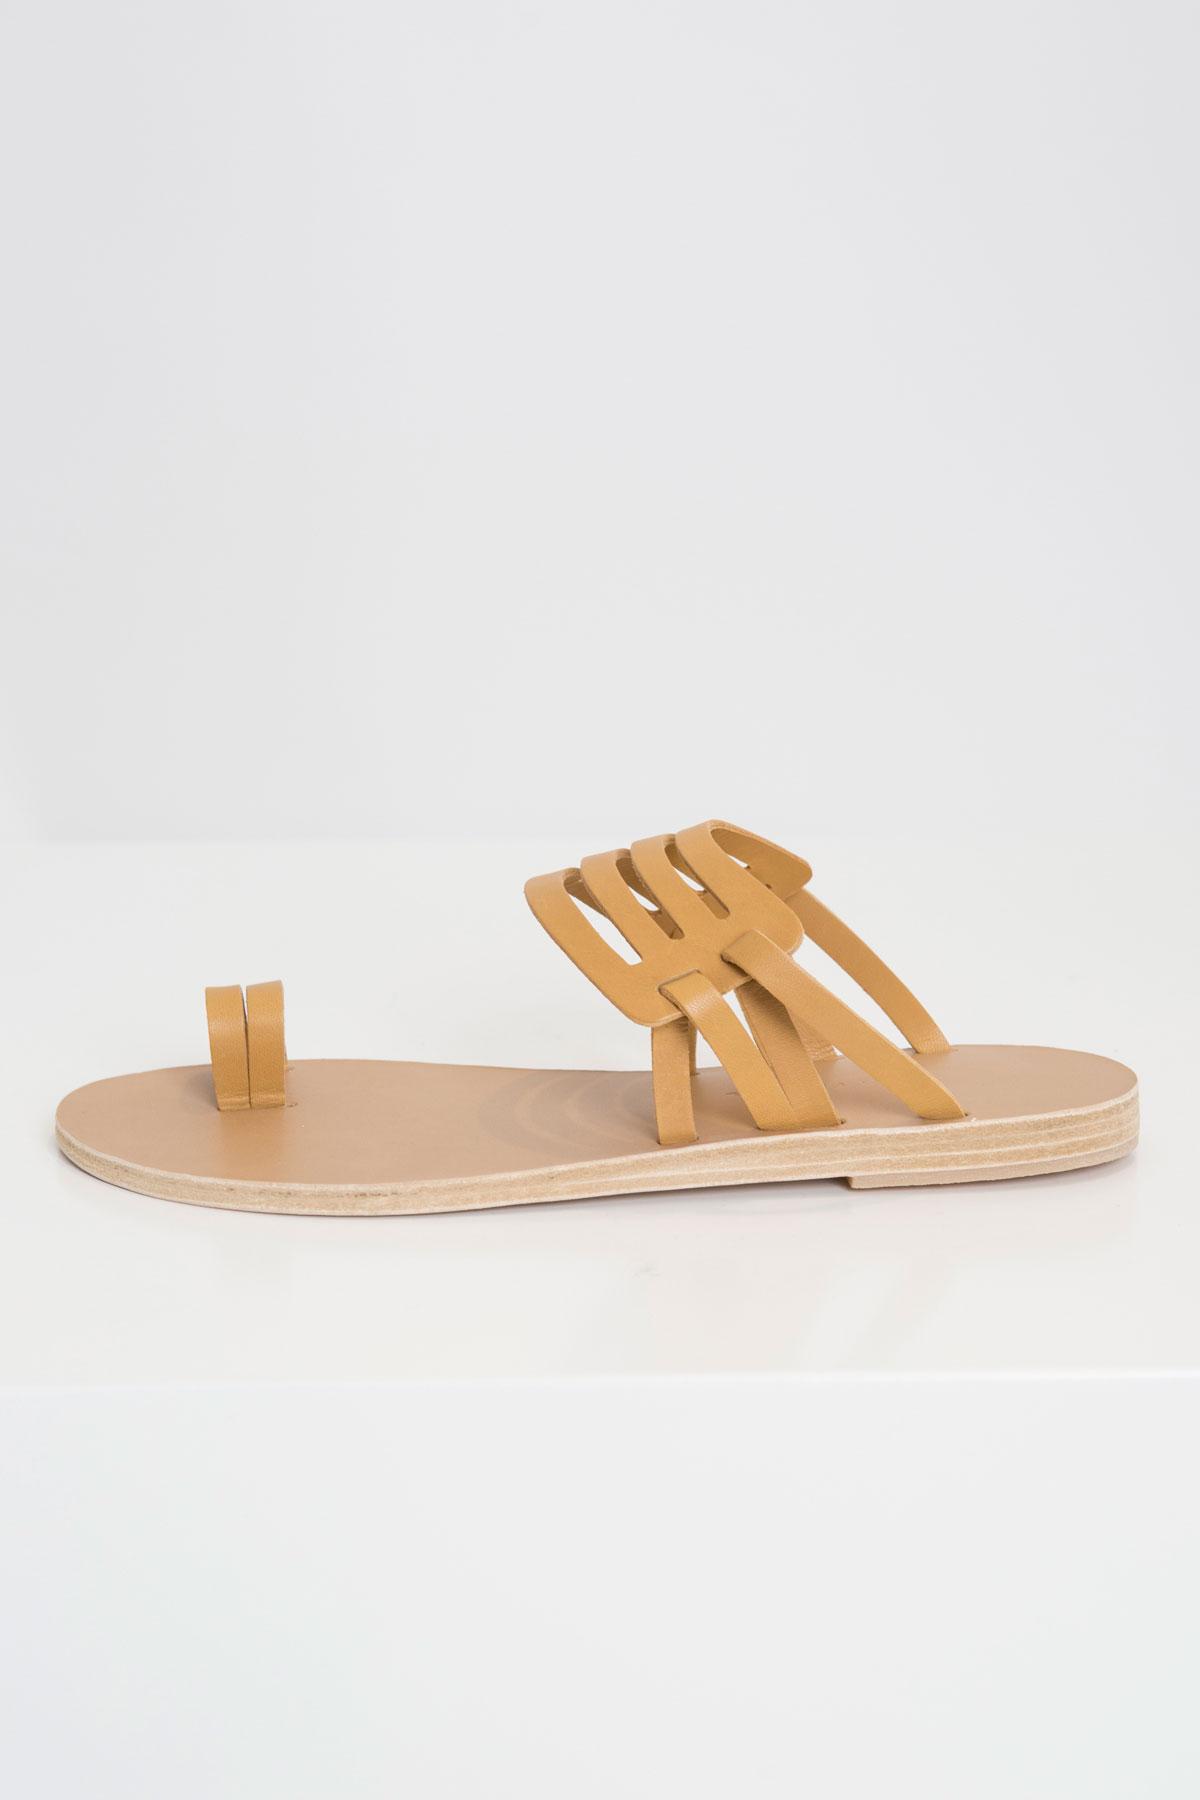 zighy-mustard-matchboxathens-valia-gabriel-greek-sandals